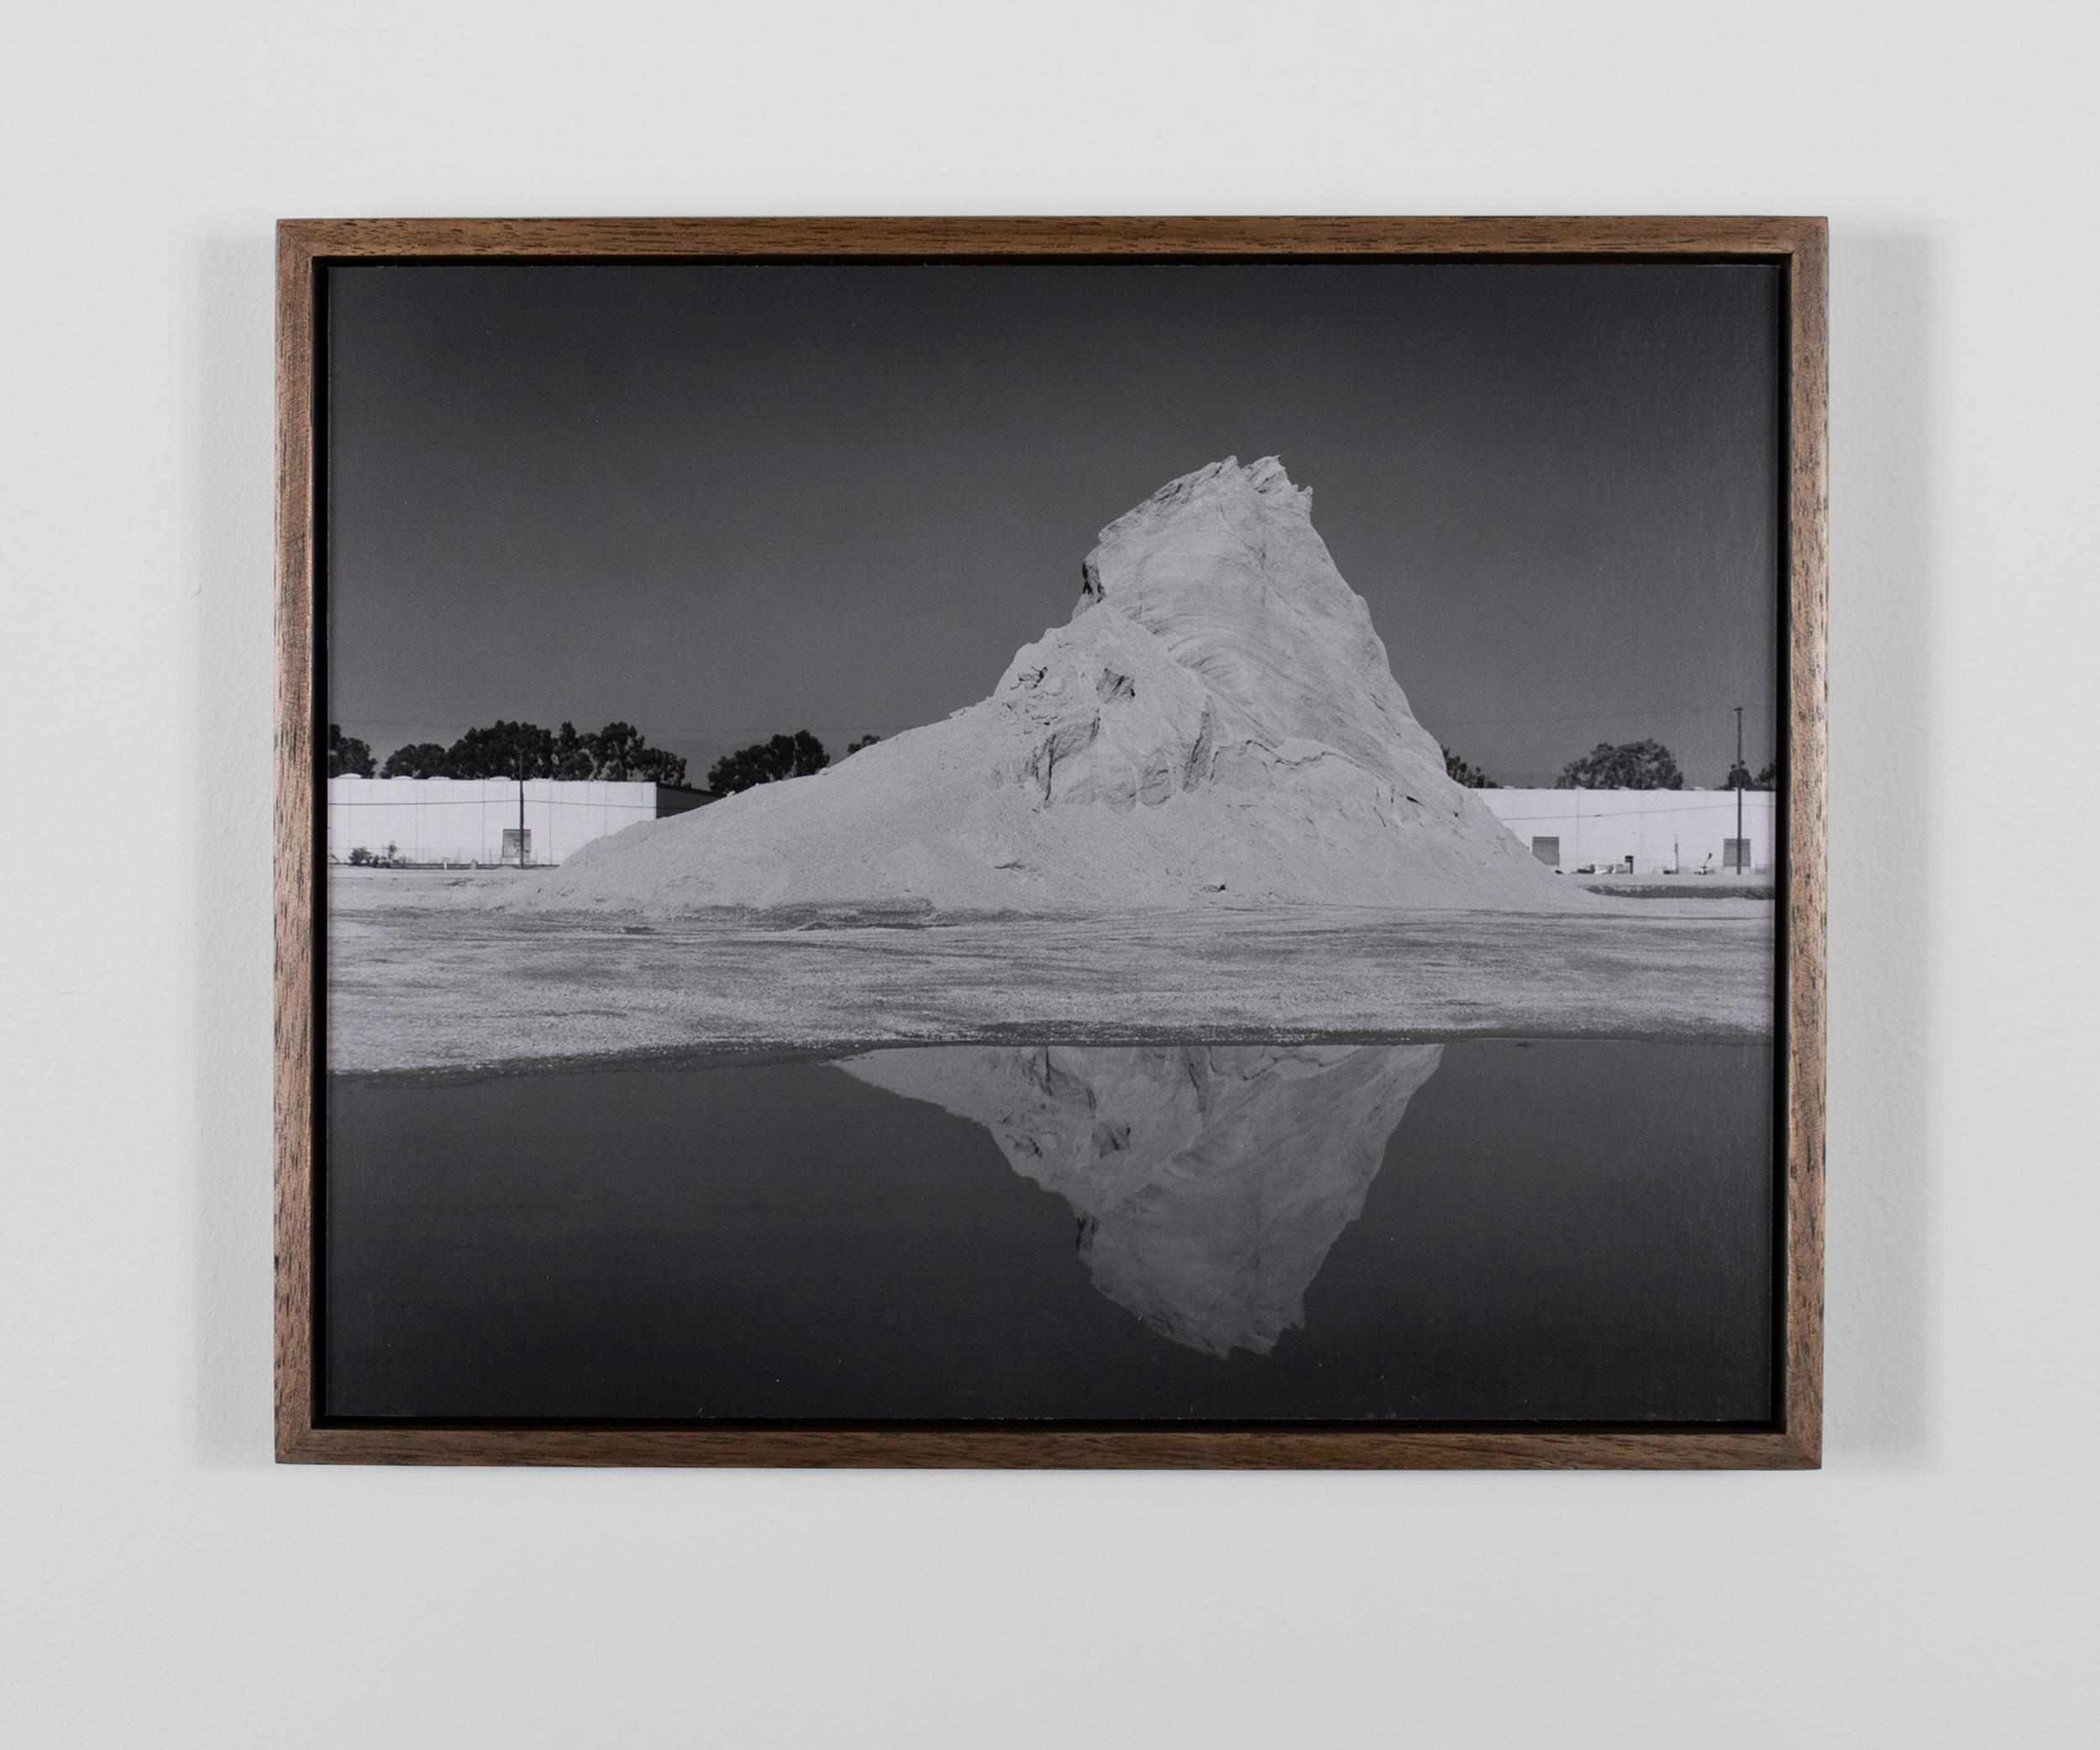 Mount Chaperone overlooking Lake Ullage 2009/10 Gelatin-silver print on Dibond, with walnut frame